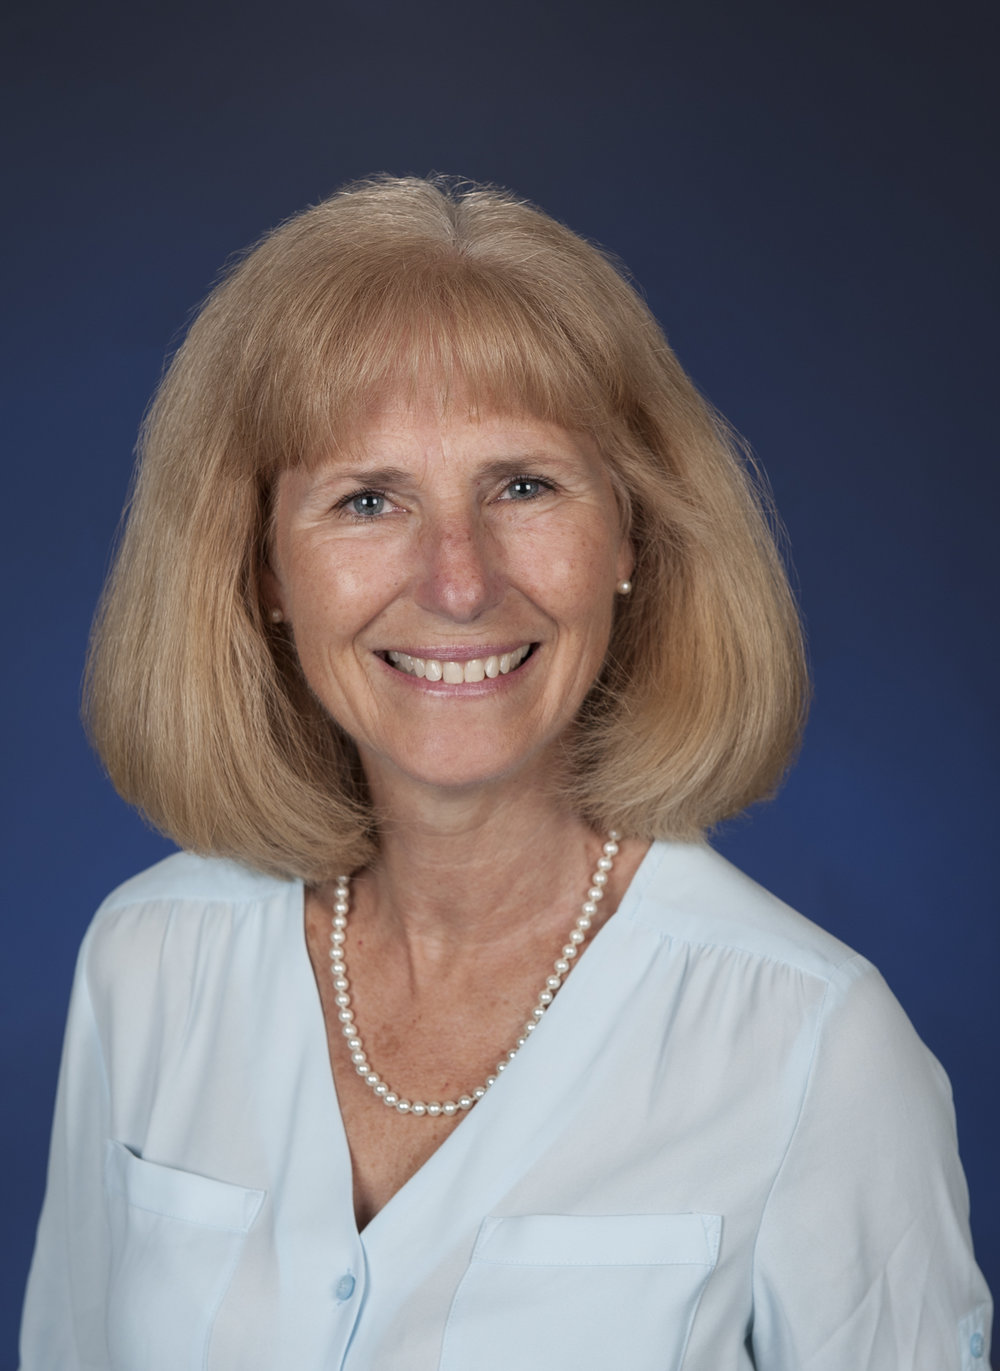 Pam Soltis